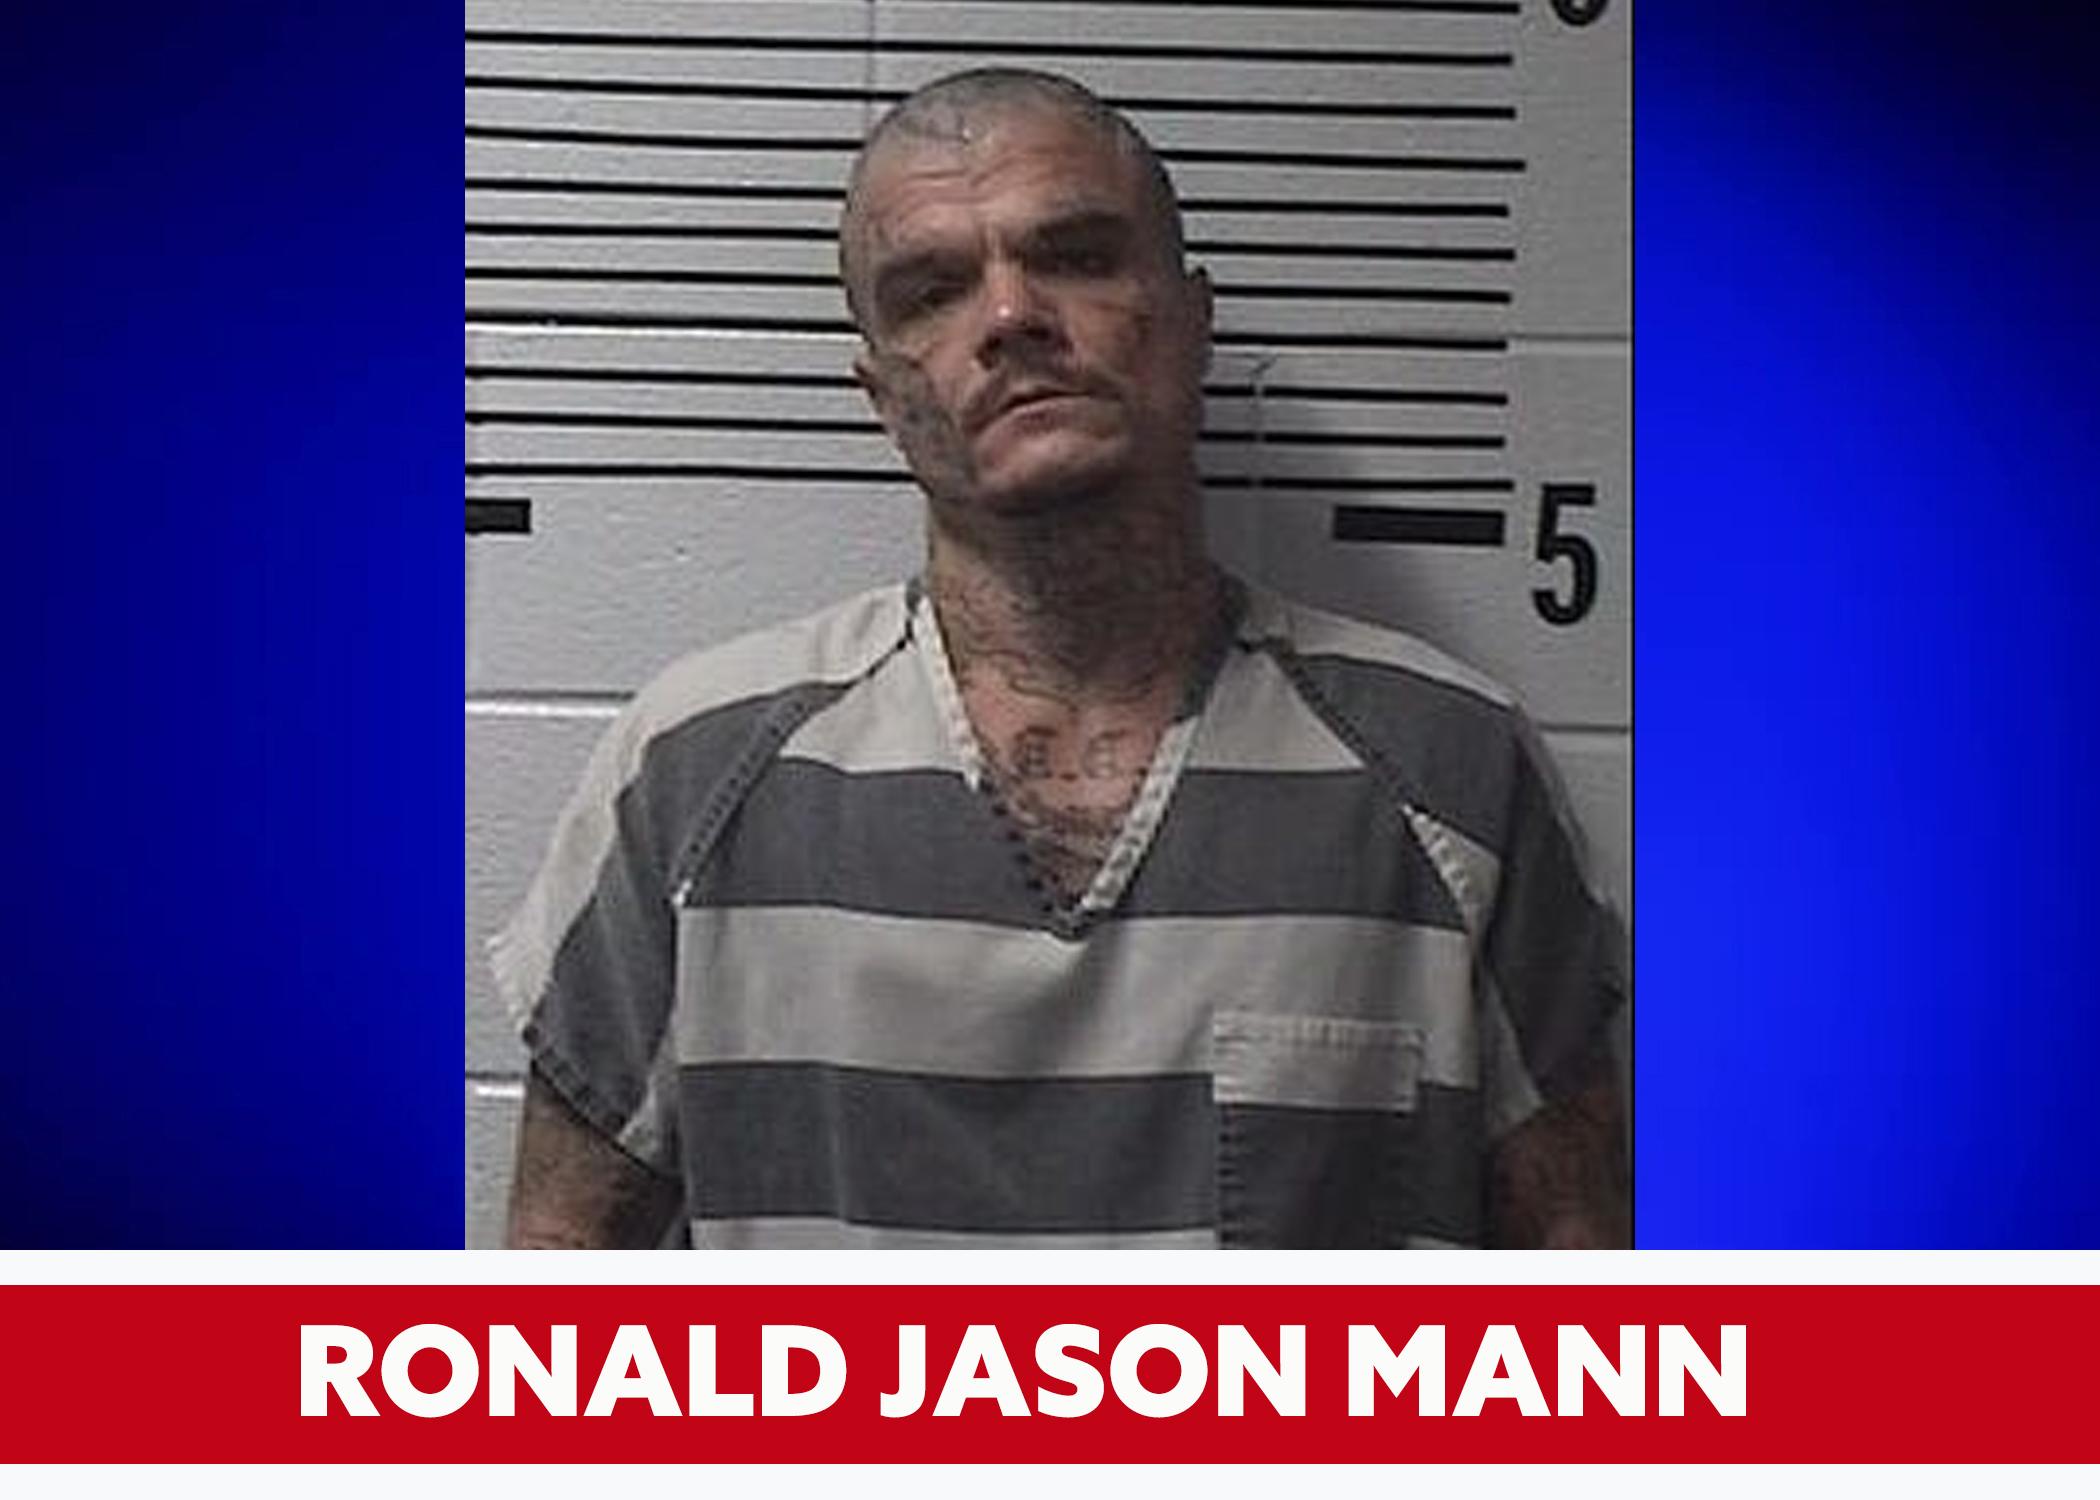 Suspect in stabbing death of 'Good Samaritan' makes plea deal